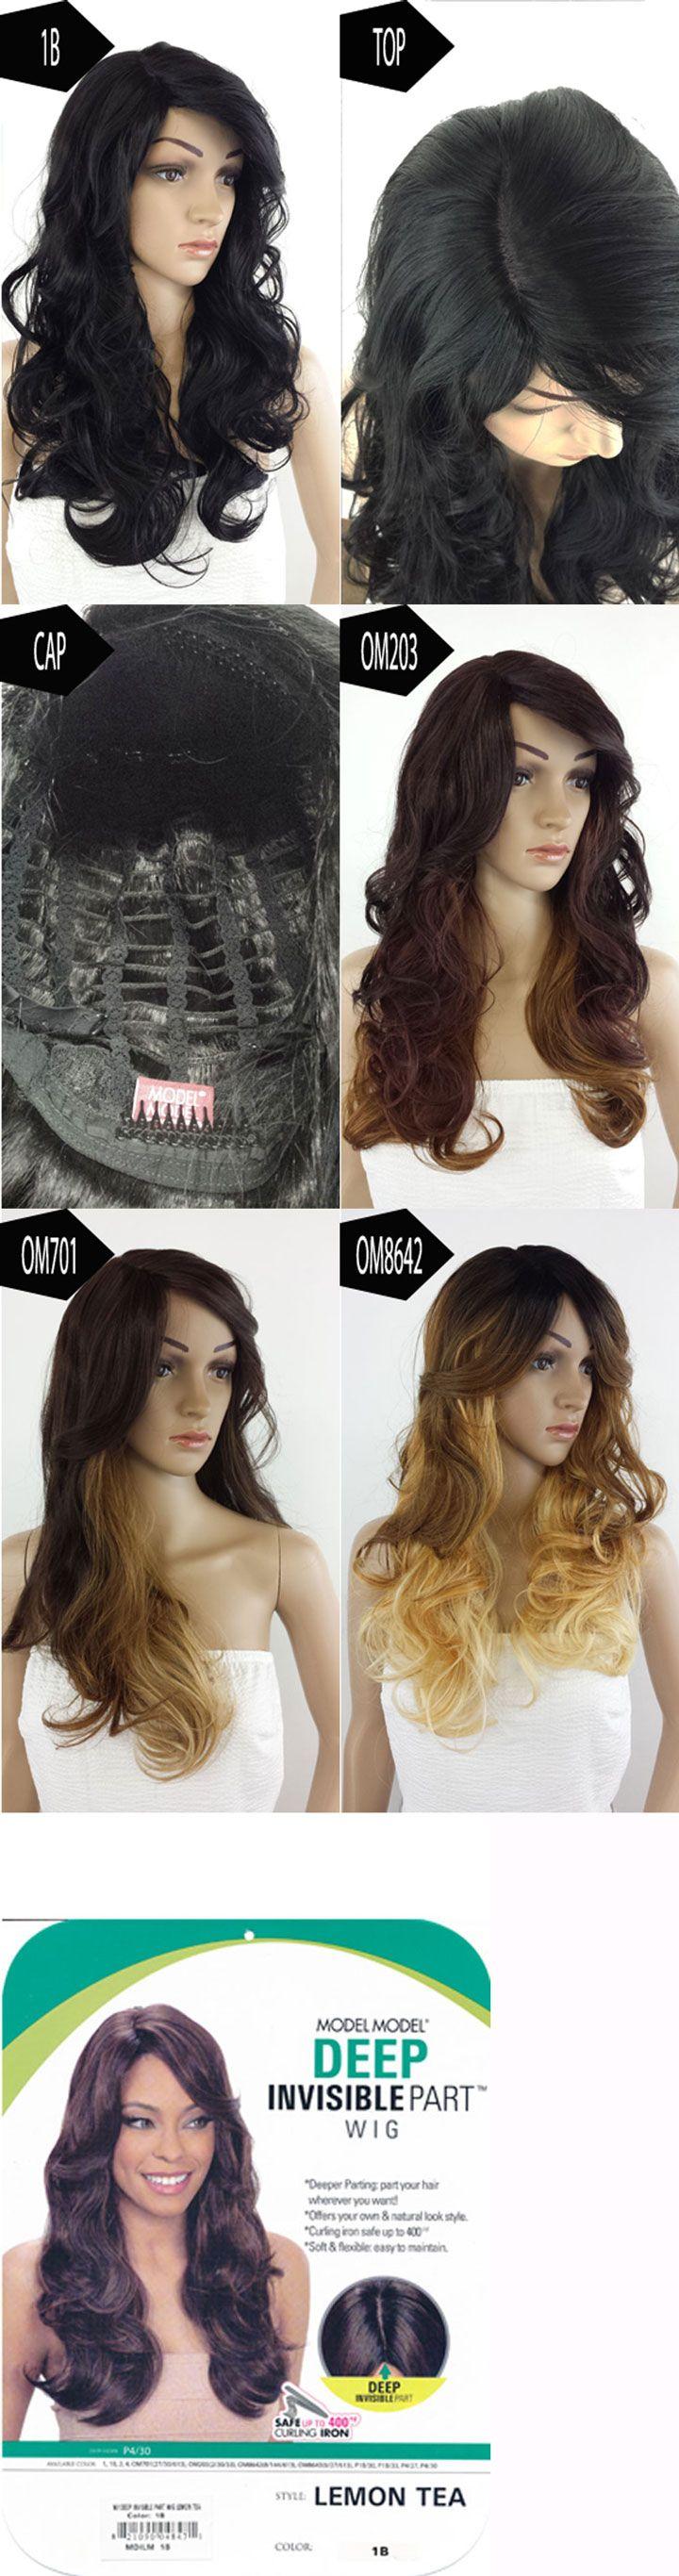 62 best Same Girl Different hair images on Pinterest